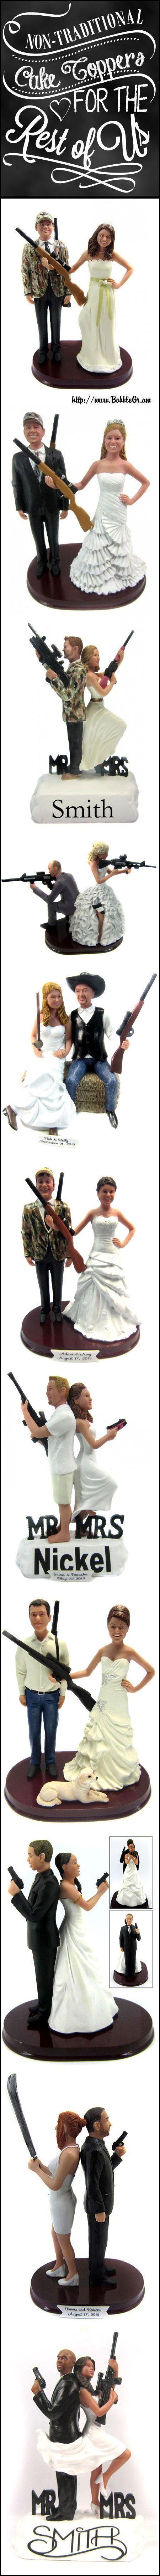 Walker inman wedding